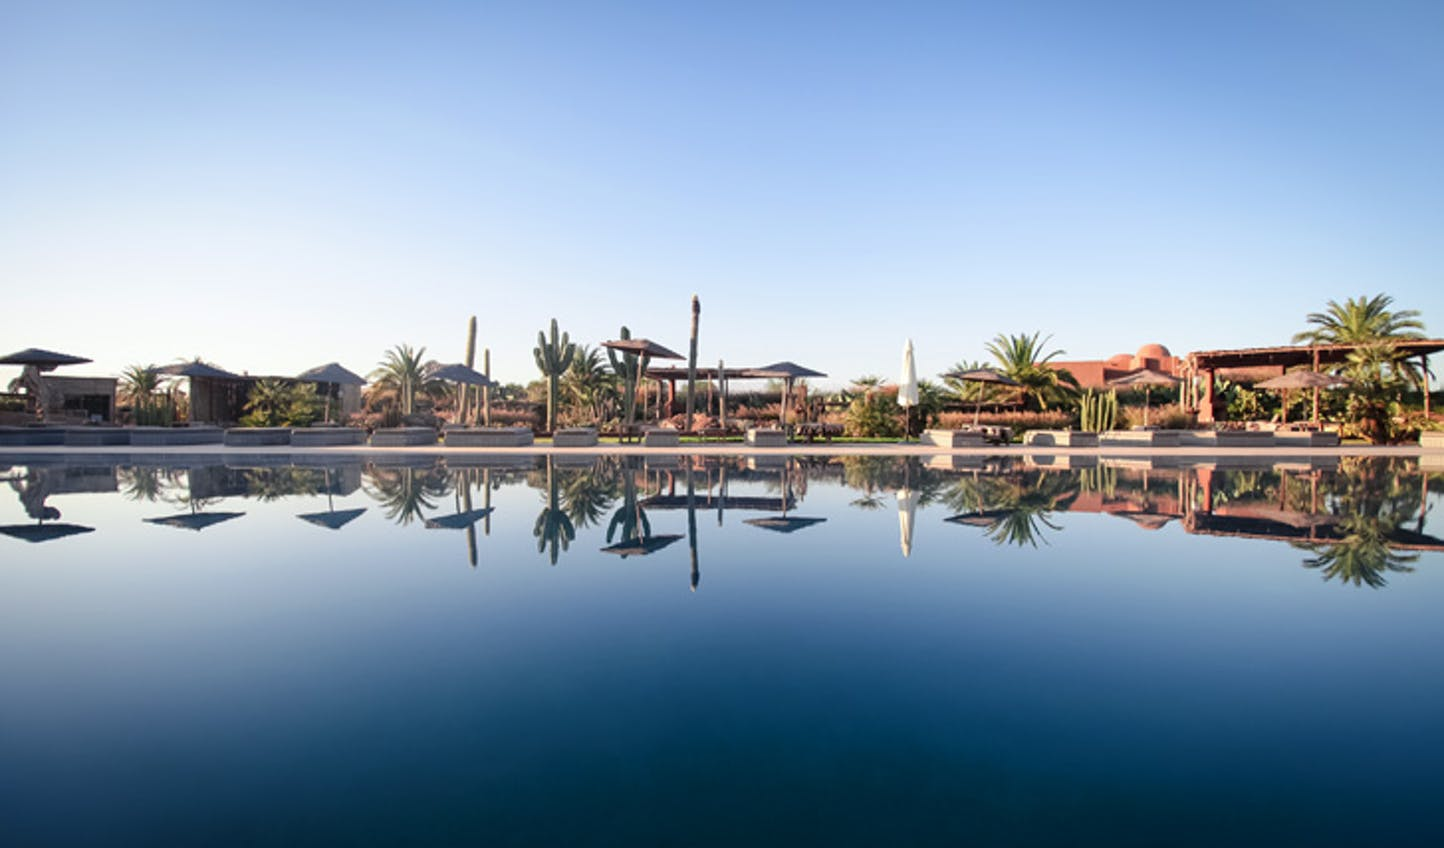 Luxury holidays in Marrakech